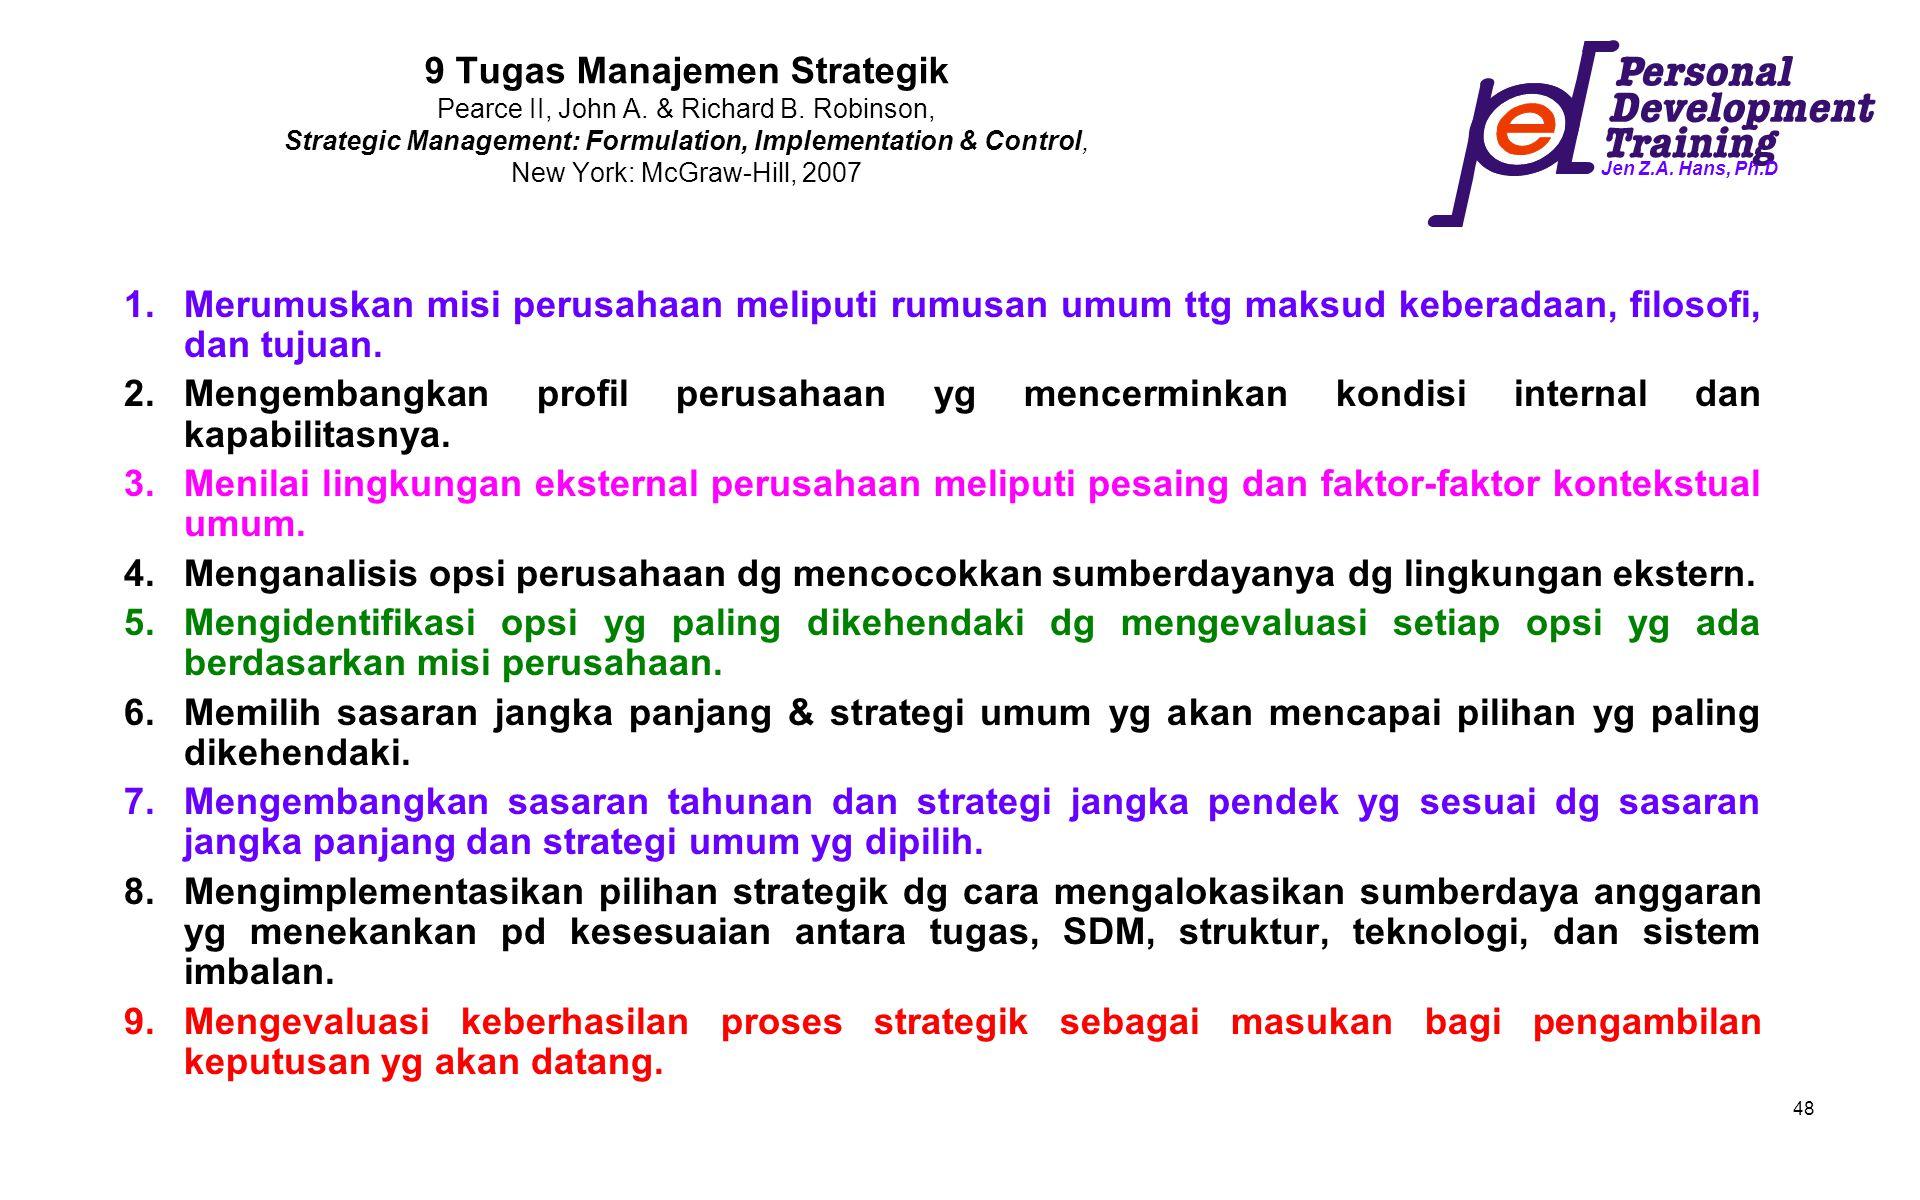 9 Tugas Manajemen Strategik Pearce II, John A. & Richard B